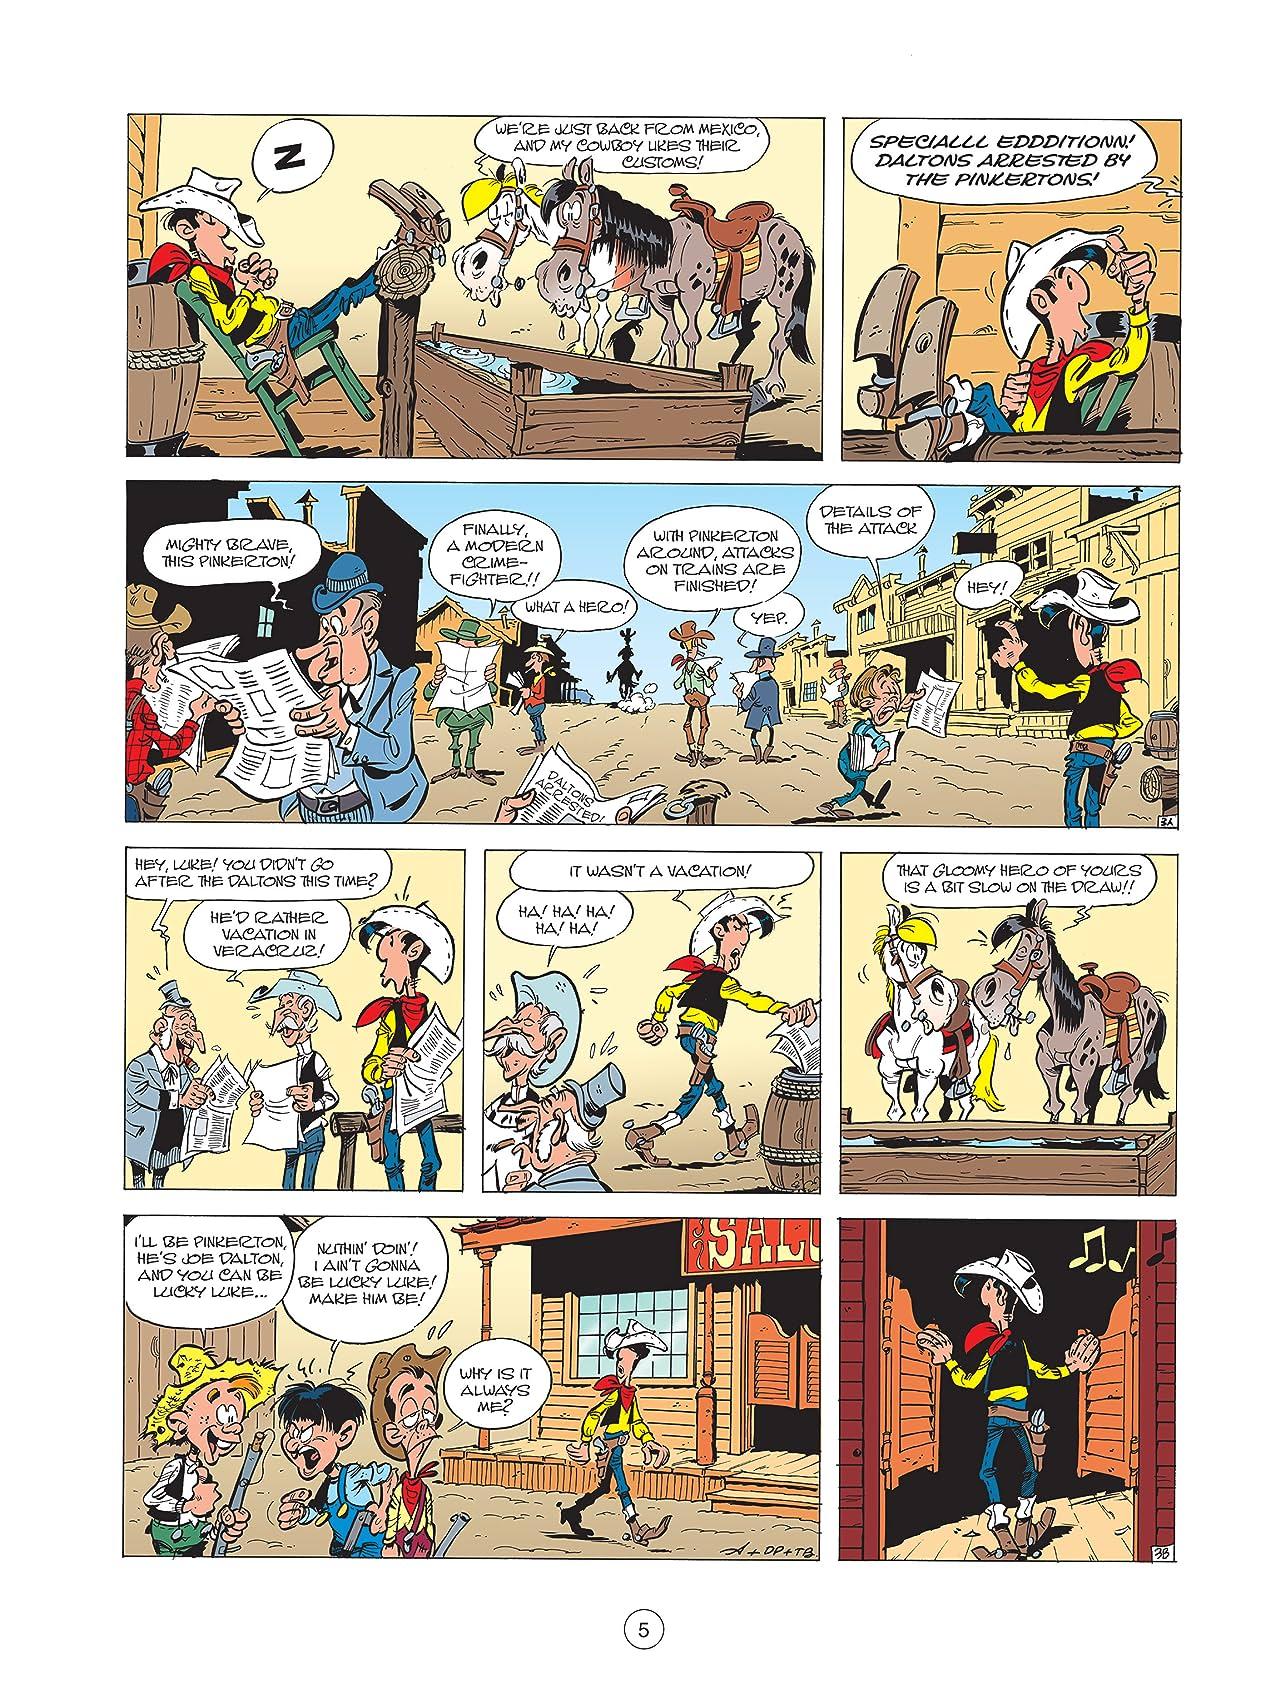 Lucky Luke Vol. 31: Lucky Luke versus The Pinkertons